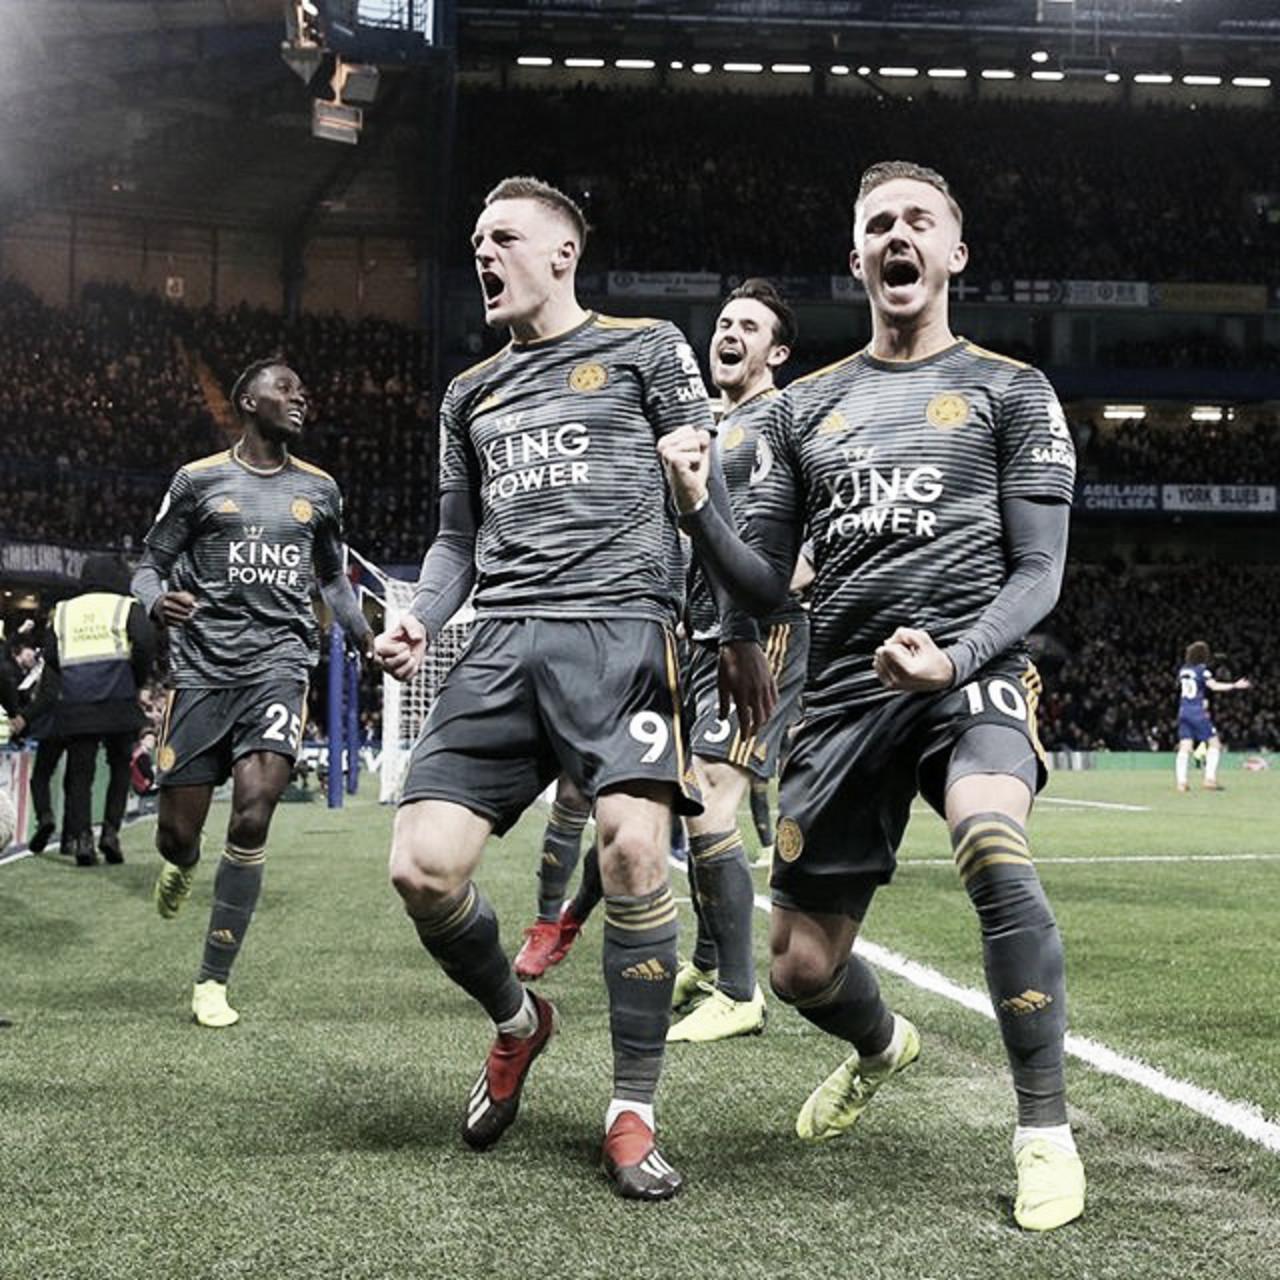 Leicester surpreende e derrota o Chelsea em Stamford Bridge